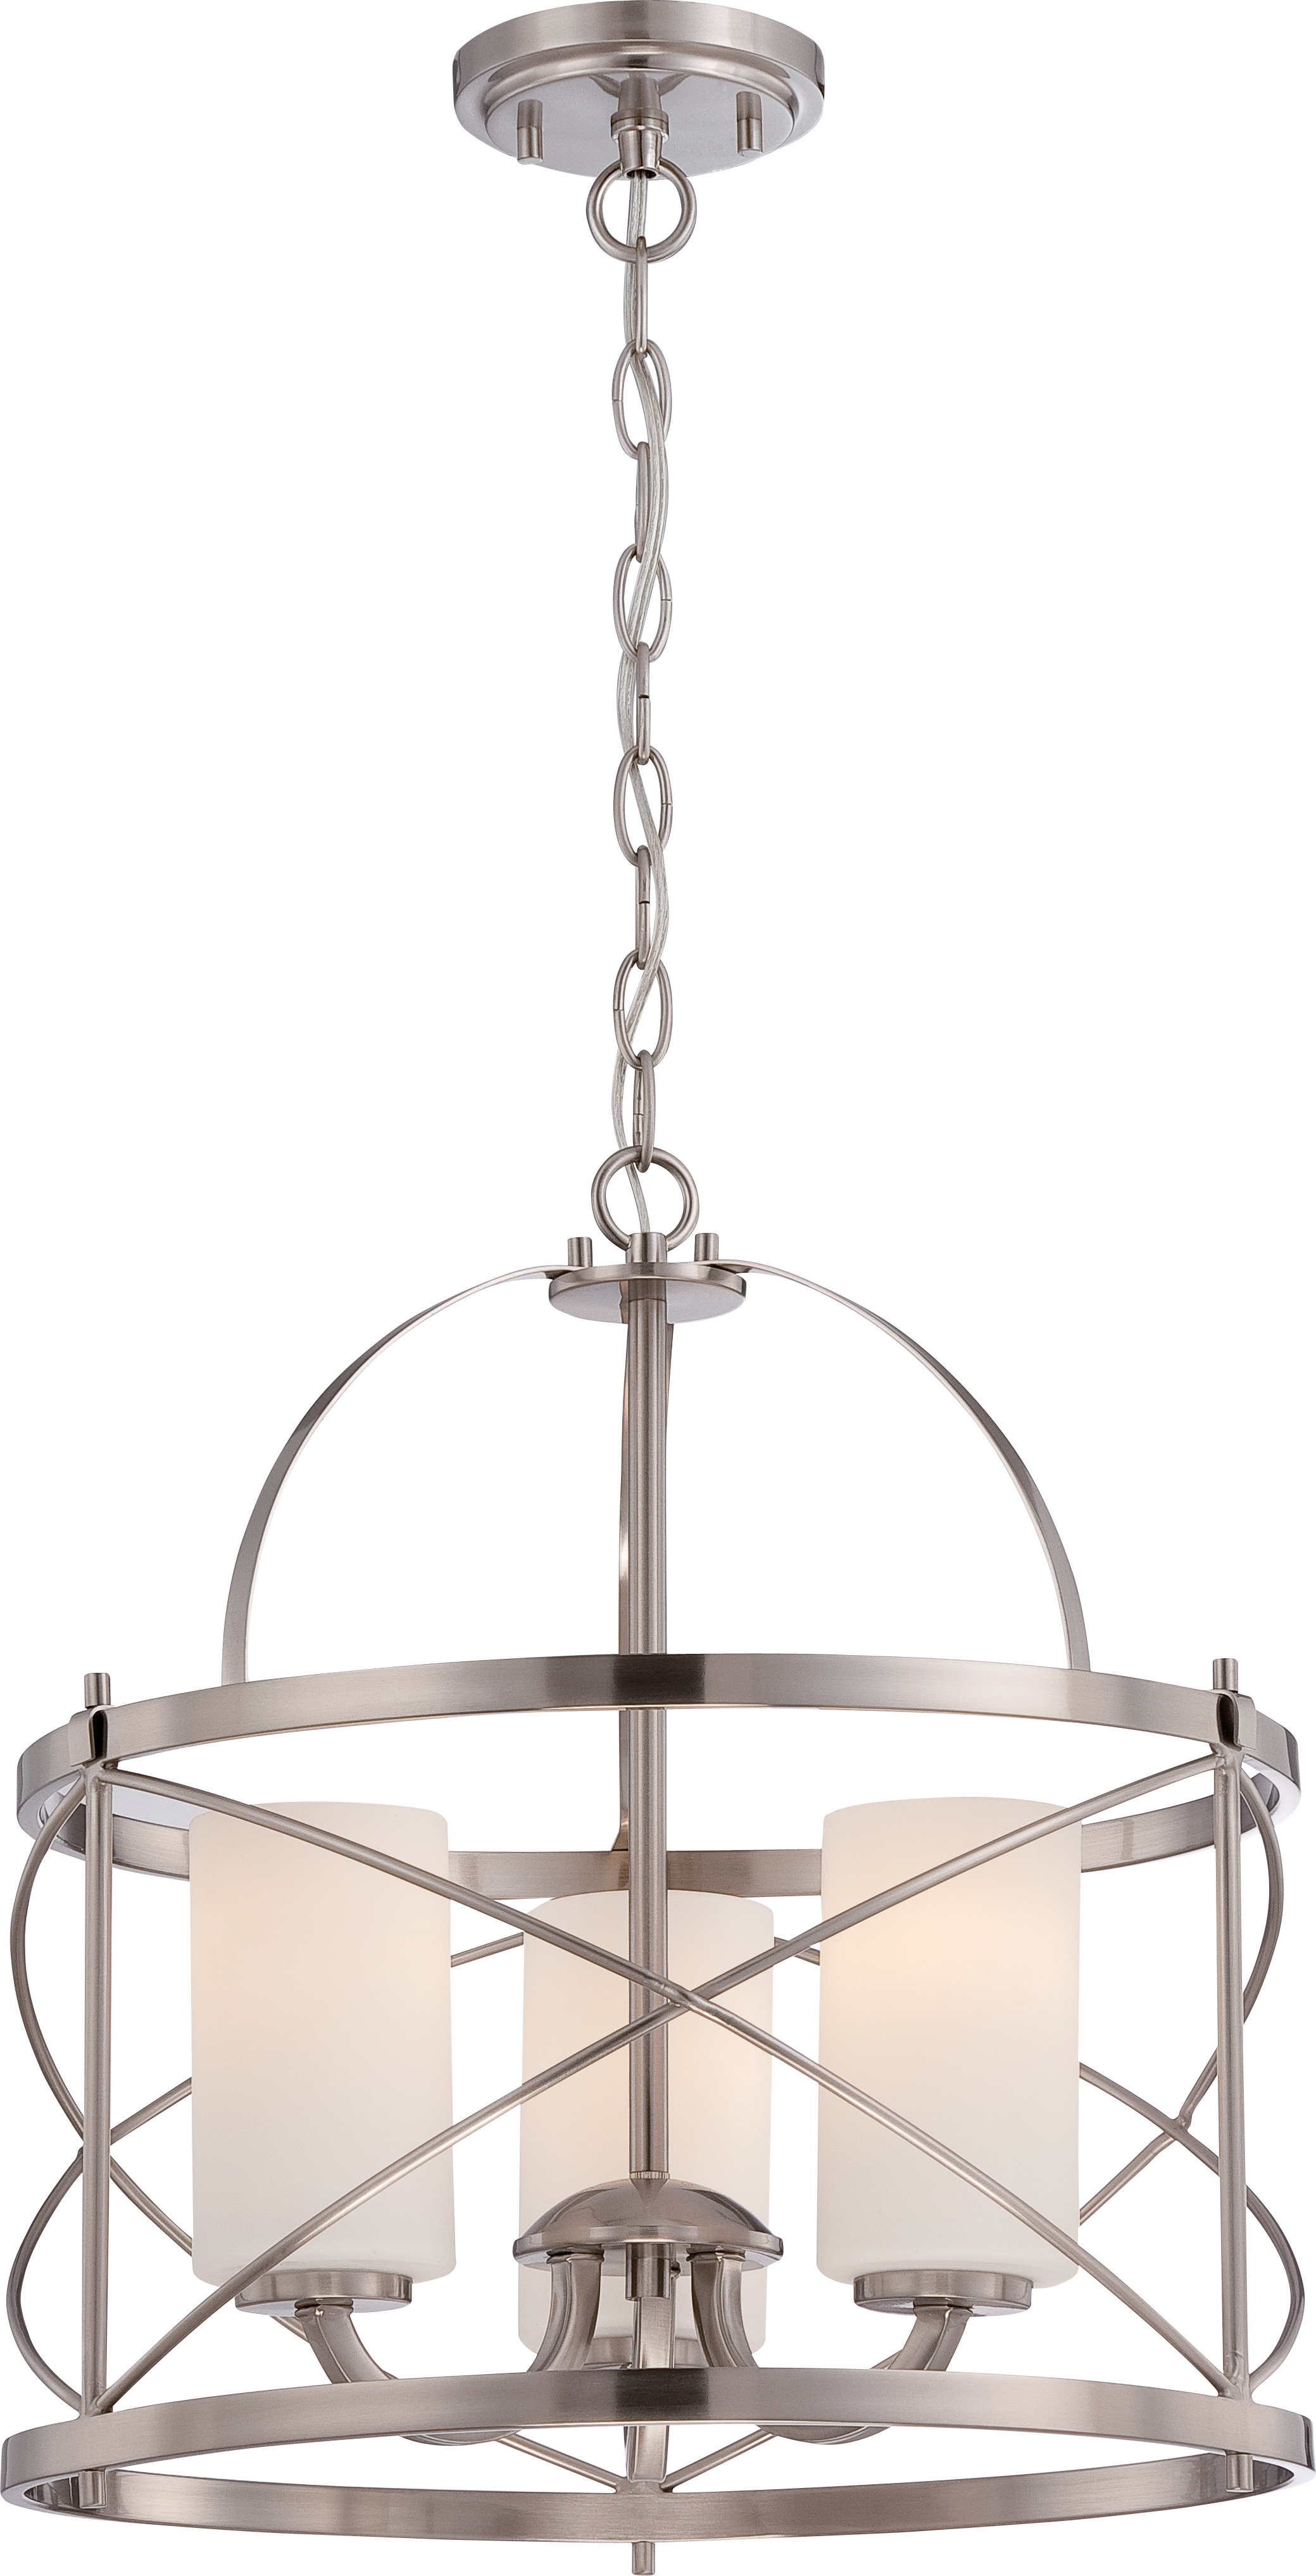 Widely Used Farrier 3 Light Lantern Drum Pendant Inside Armande 3 Light Lantern Geometric Pendants (View 22 of 25)